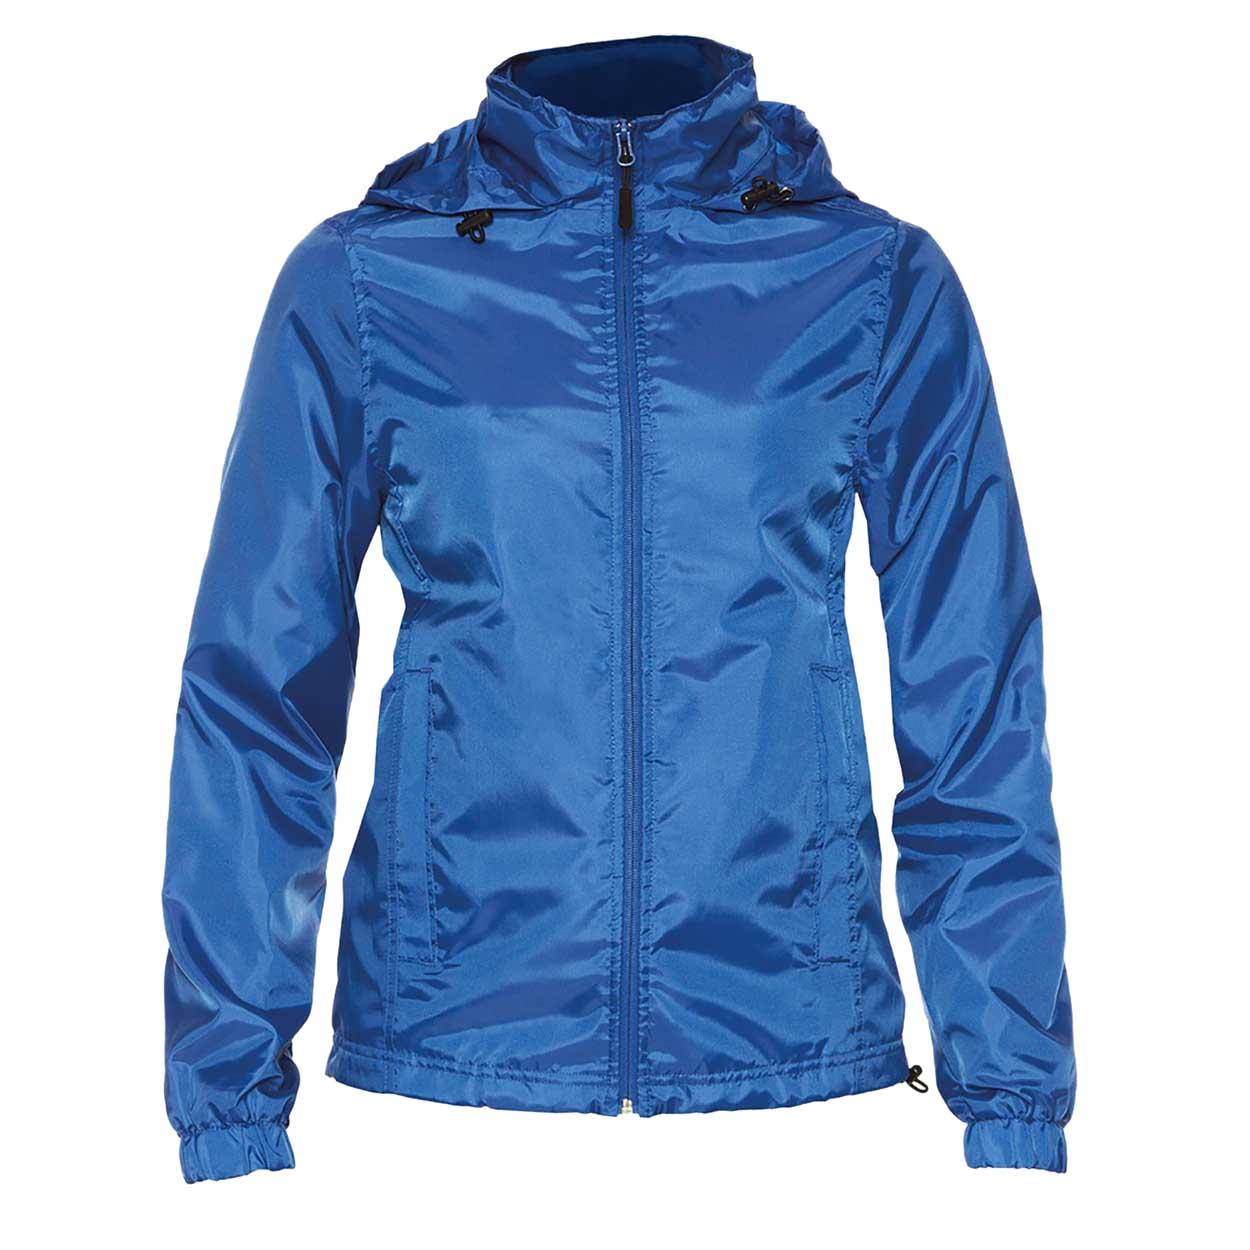 Gildan Womens/Ladies Hammer Windwear Jacket (M) (Royal Blue)